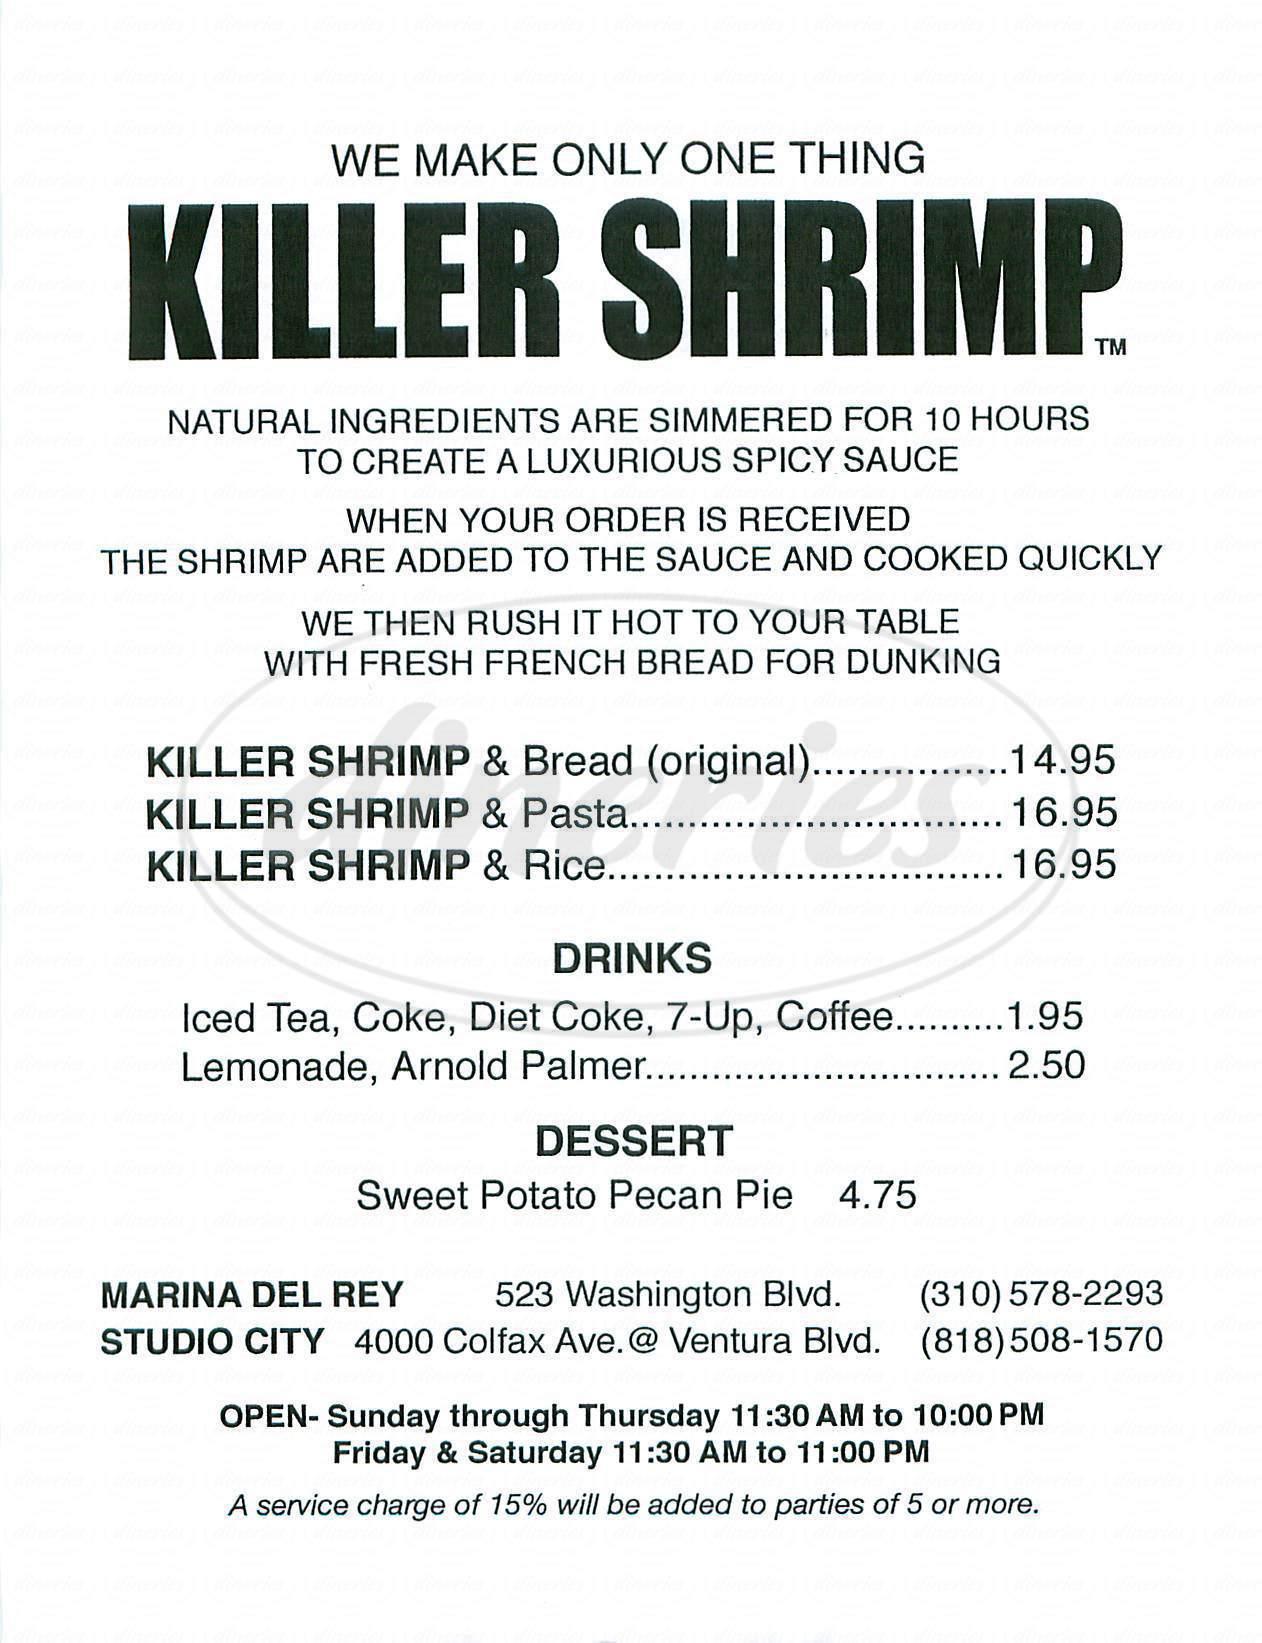 menu for Killer Shrimp